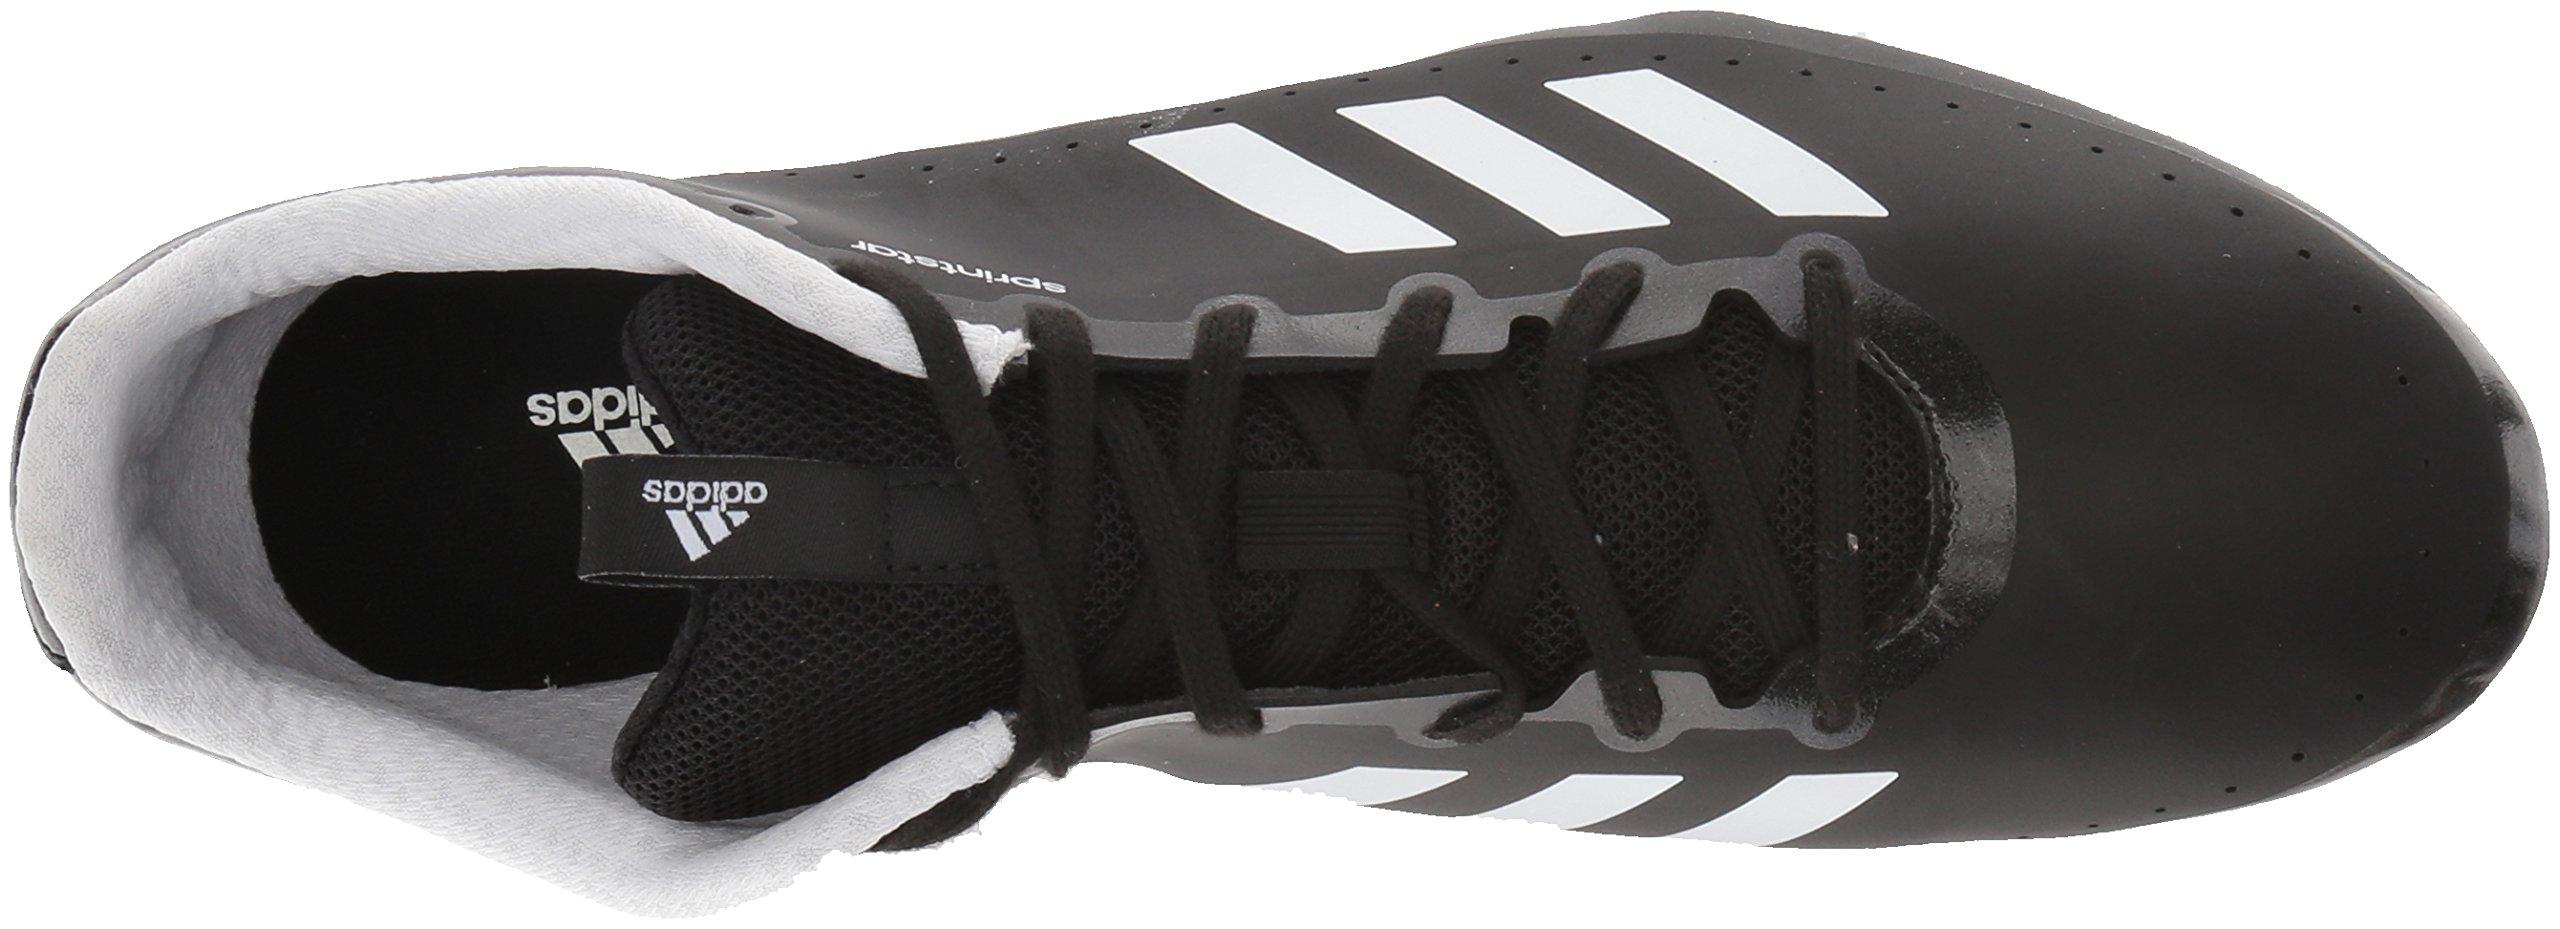 adidas Women's Sprintstar w, Core Black/Orange/White, 5.5 M US by adidas (Image #7)